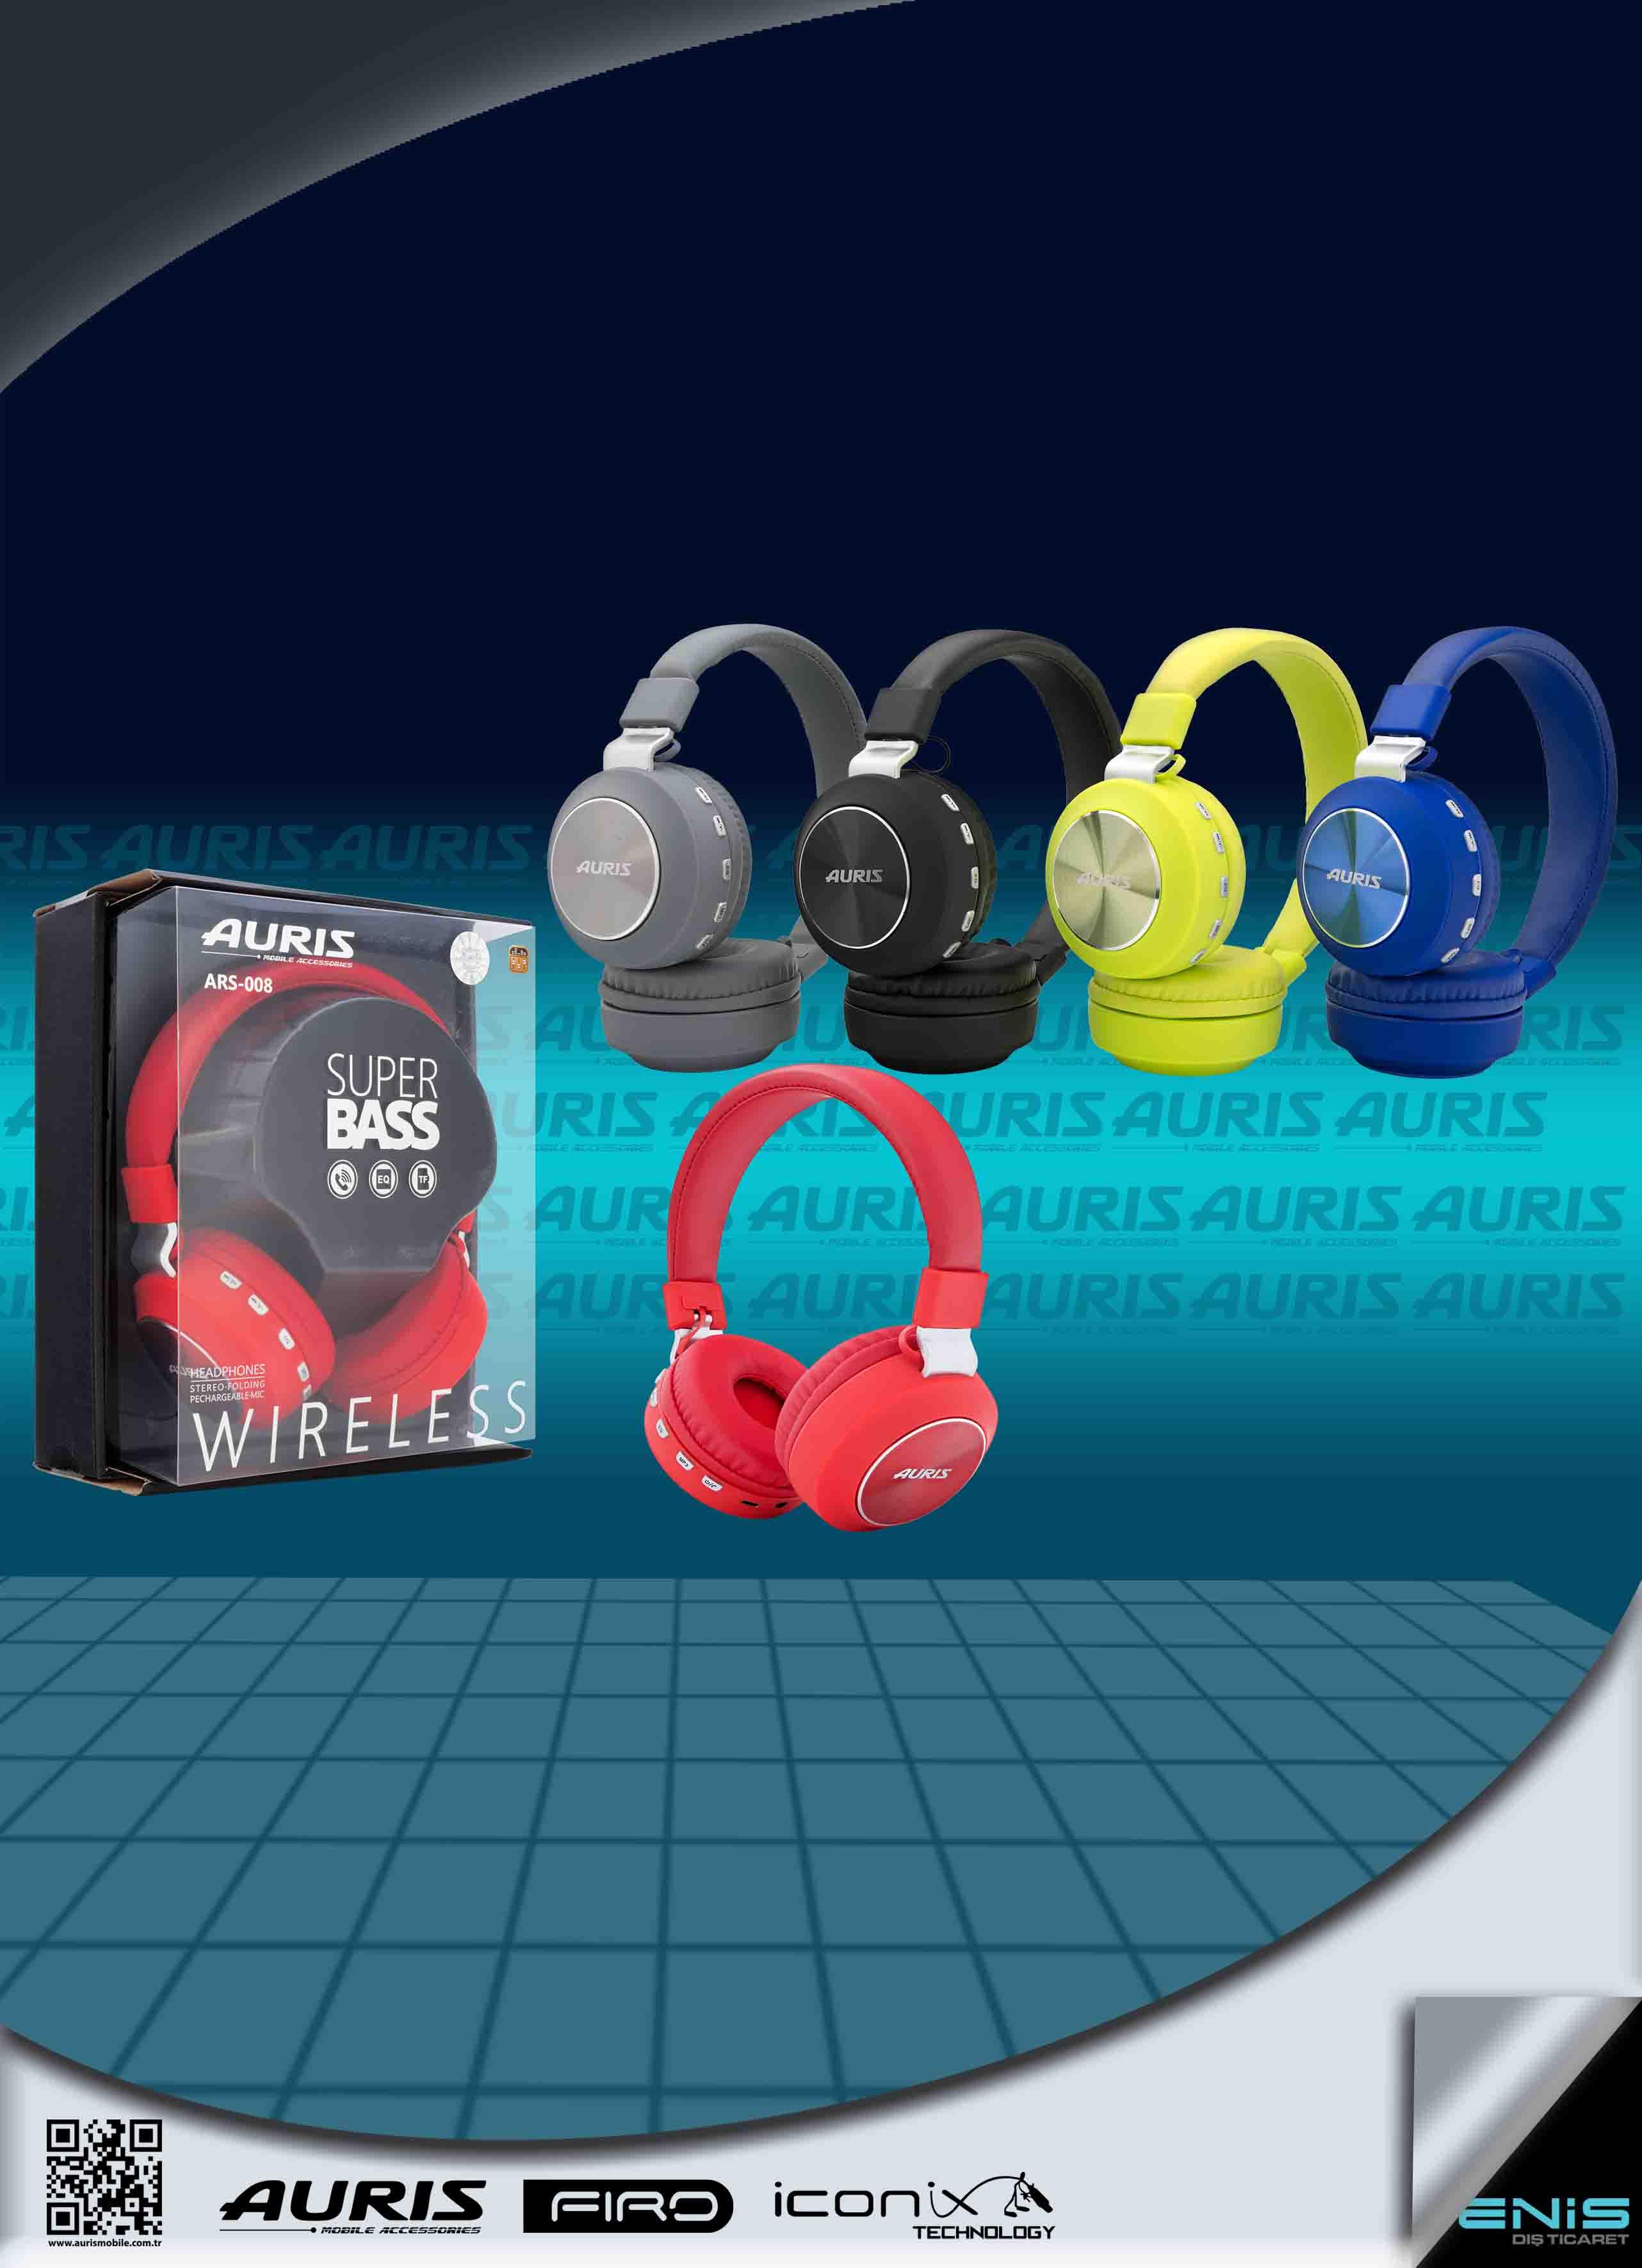 Auris Ars-008 Kafa ÜstÜ Kablosuz Kulaklık